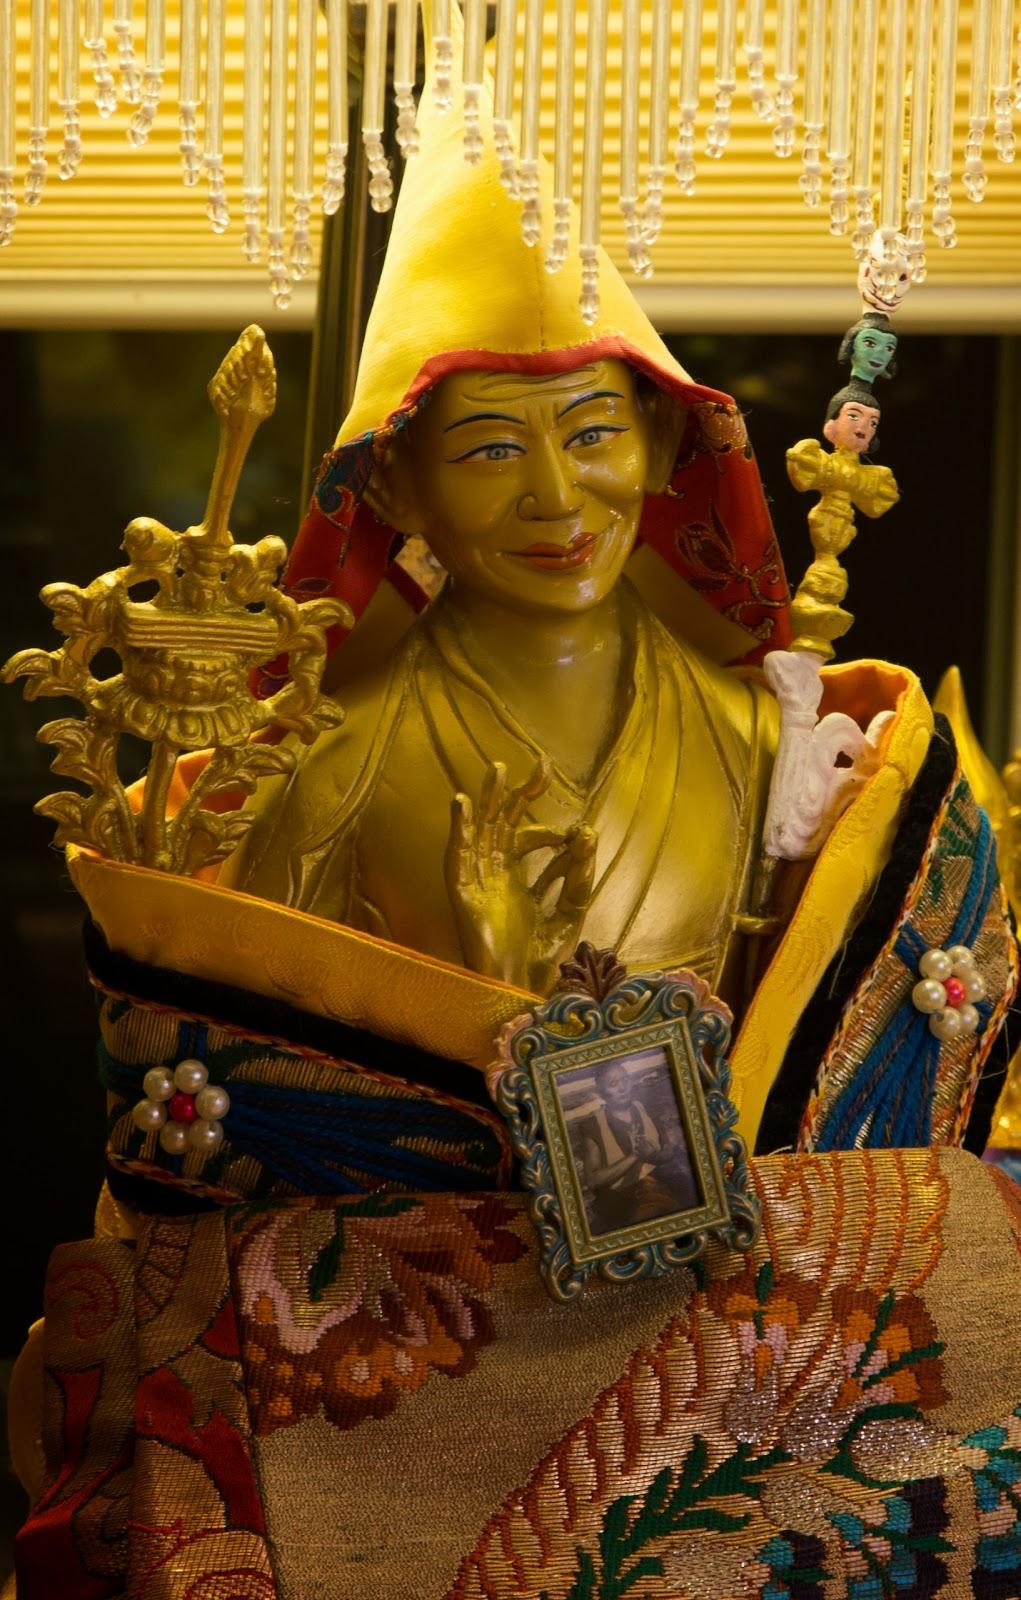 Statue in the Prajnaparamita room. Photo by Ven. Thubten Kunsang.